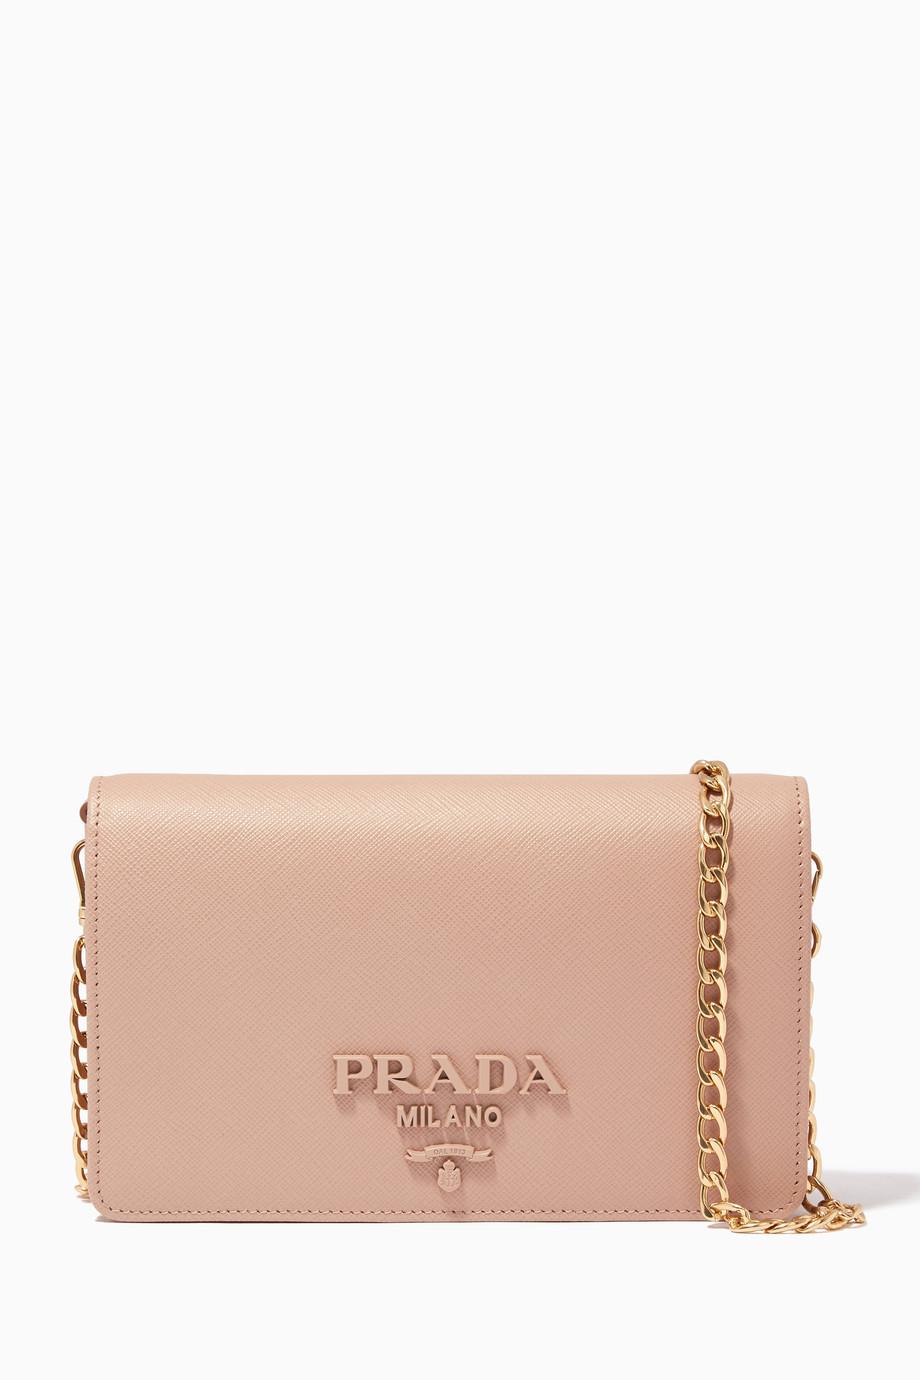 fcb8b5c2926d Shop Prada Neutral Powder-Pink Monochrome Wallet Chain Bag for Women ...